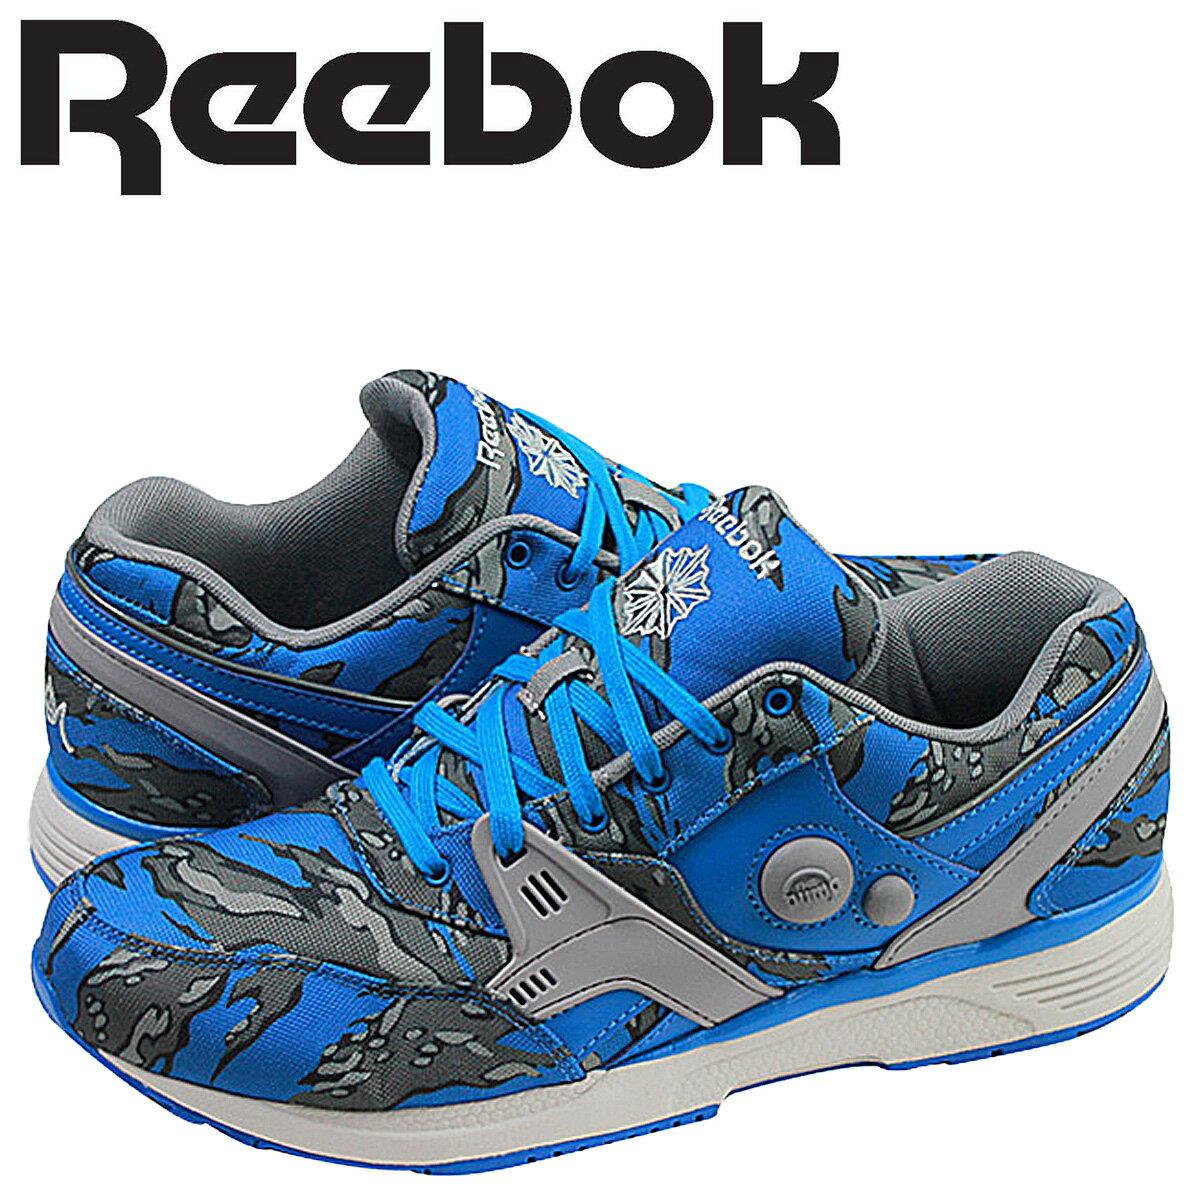 Reebok リーボック ポンプ スニーカー  PUMP RUNNING DUAL STASH COLLECTION  V61555  メンズ 靴 ブルー